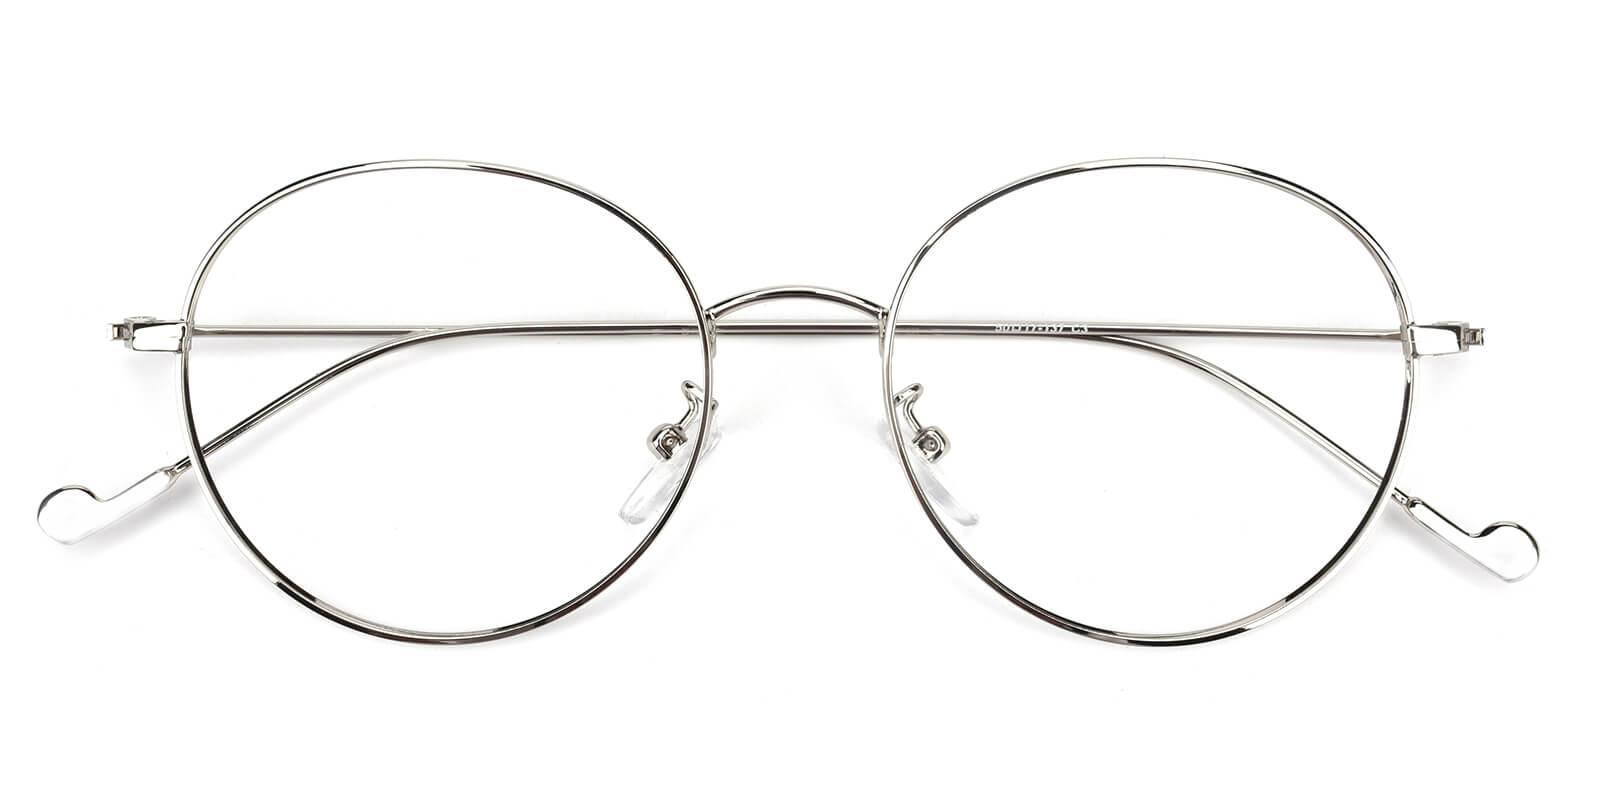 Jessy-Silver-Round-Metal-Eyeglasses-detail